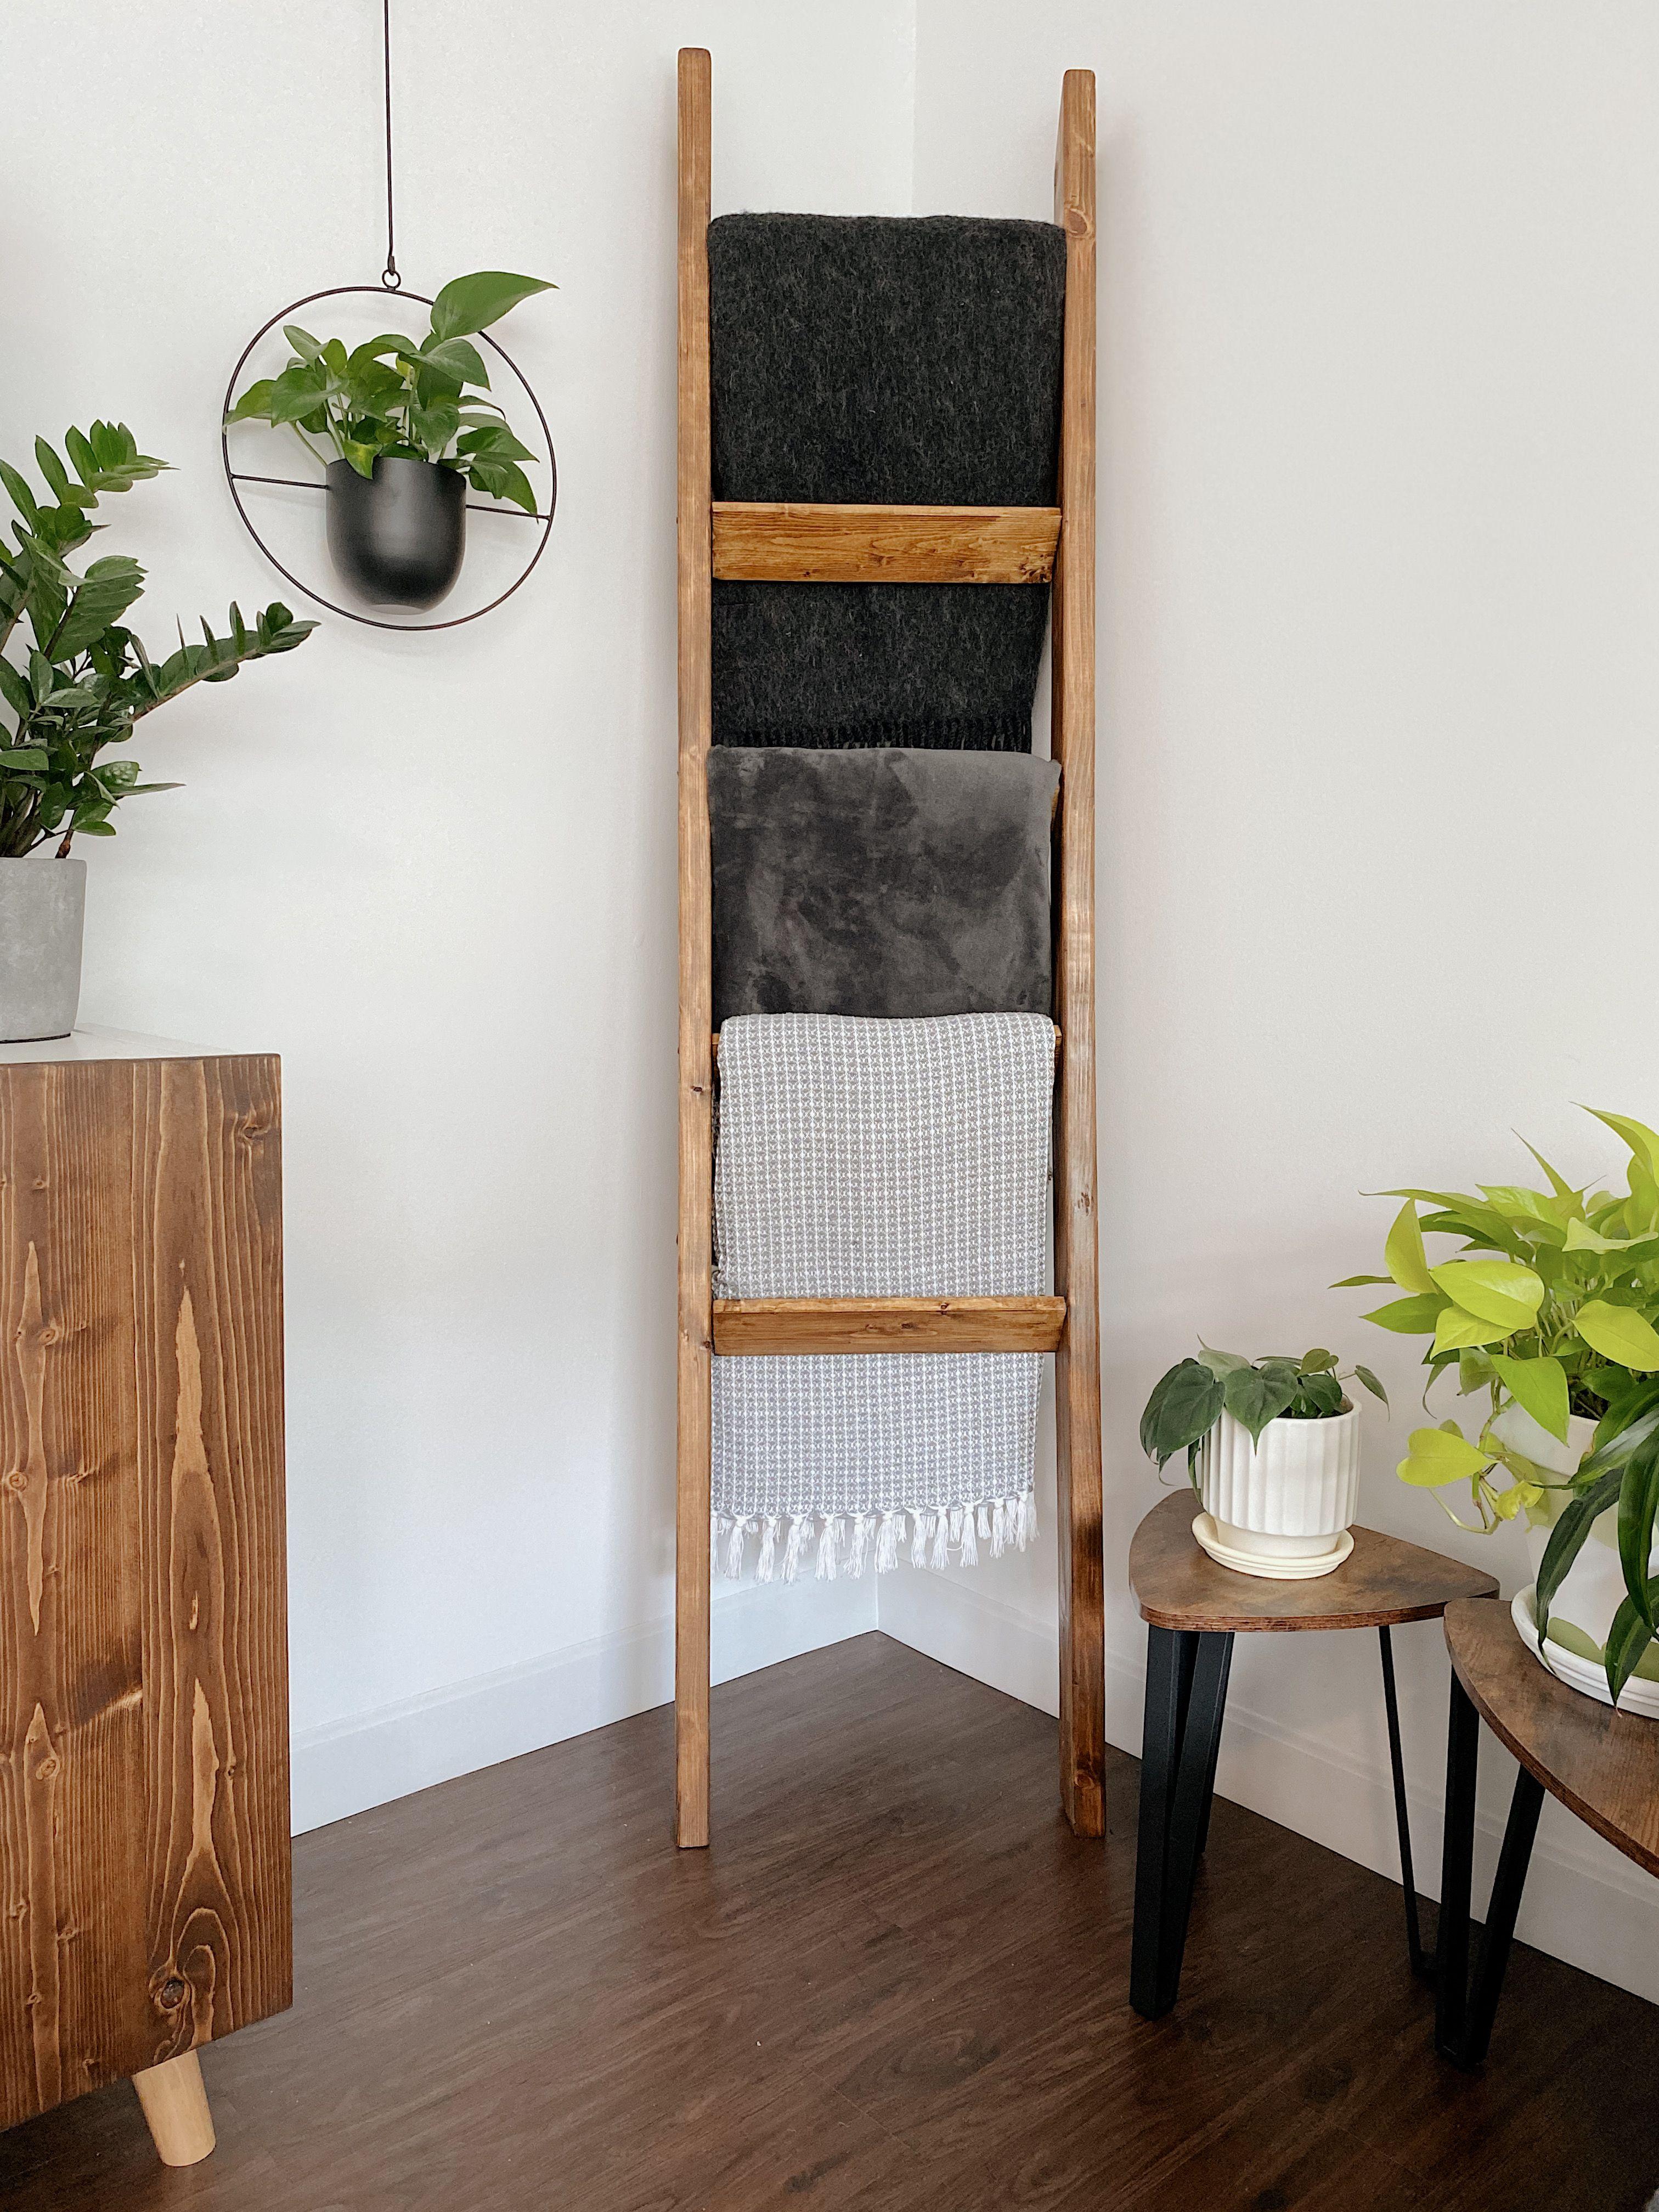 DIY Blanket Ladder in 2020 Home decor dyi, Blanket